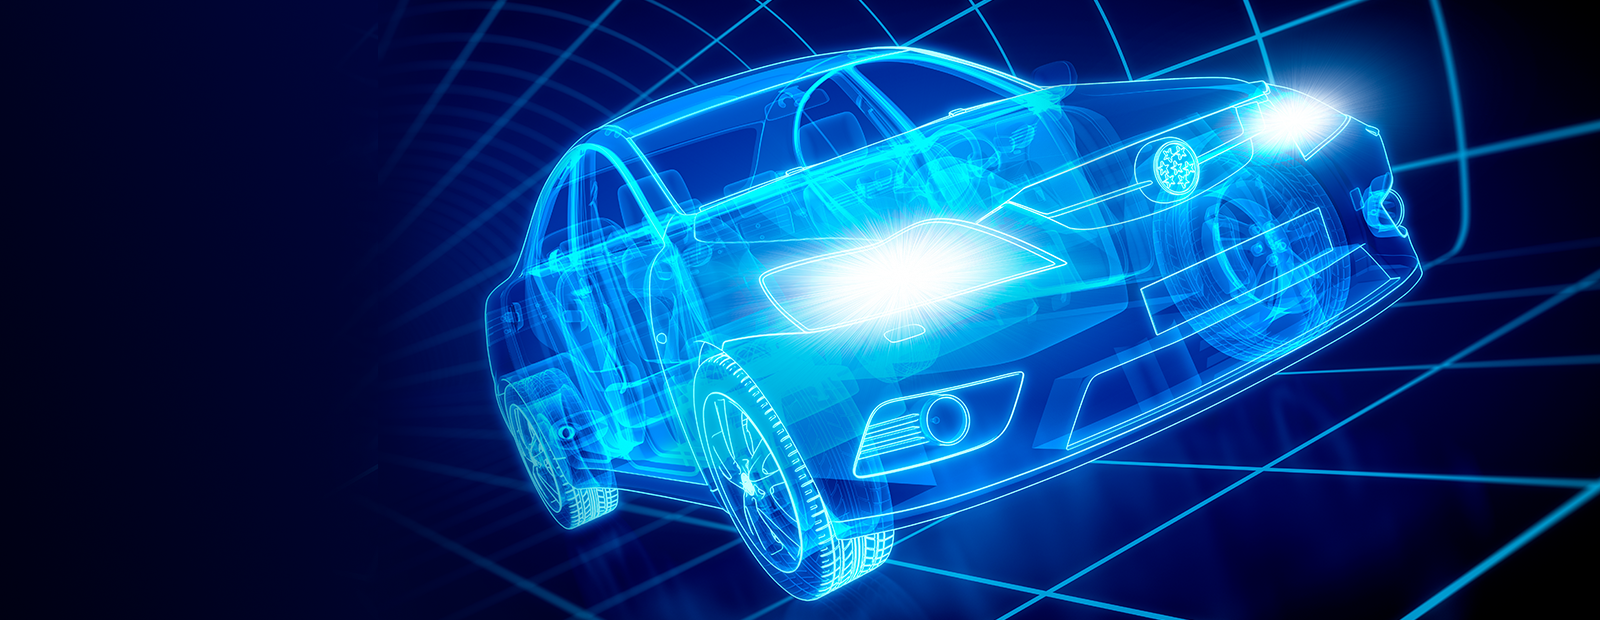 Automotive-page-banner